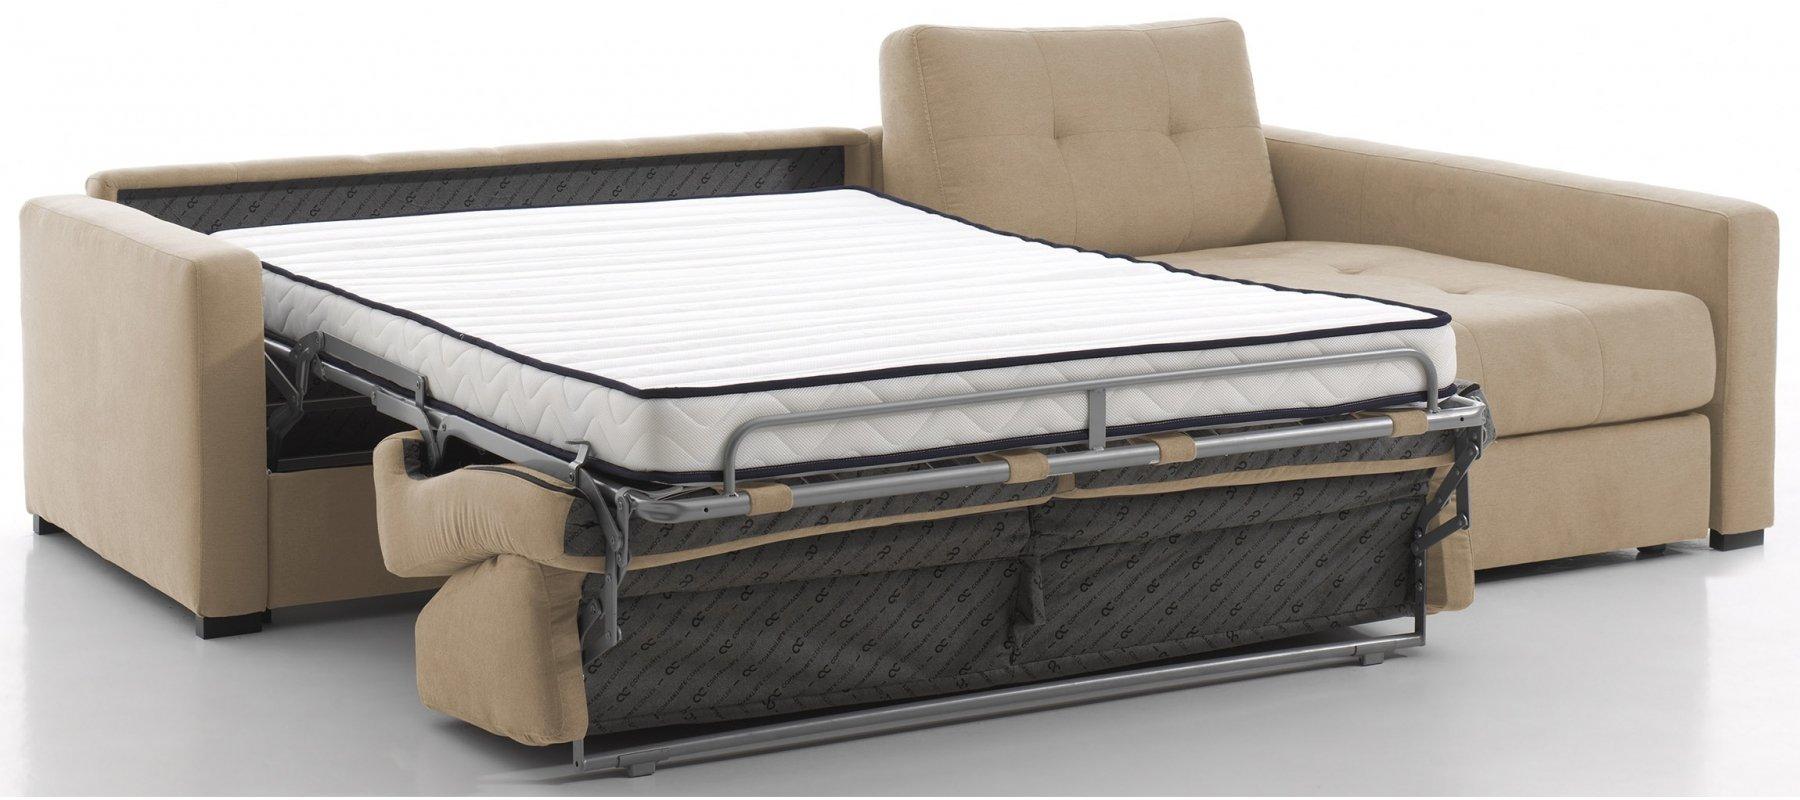 angle convertible rapido avec m ridienne r versible vente directe. Black Bedroom Furniture Sets. Home Design Ideas